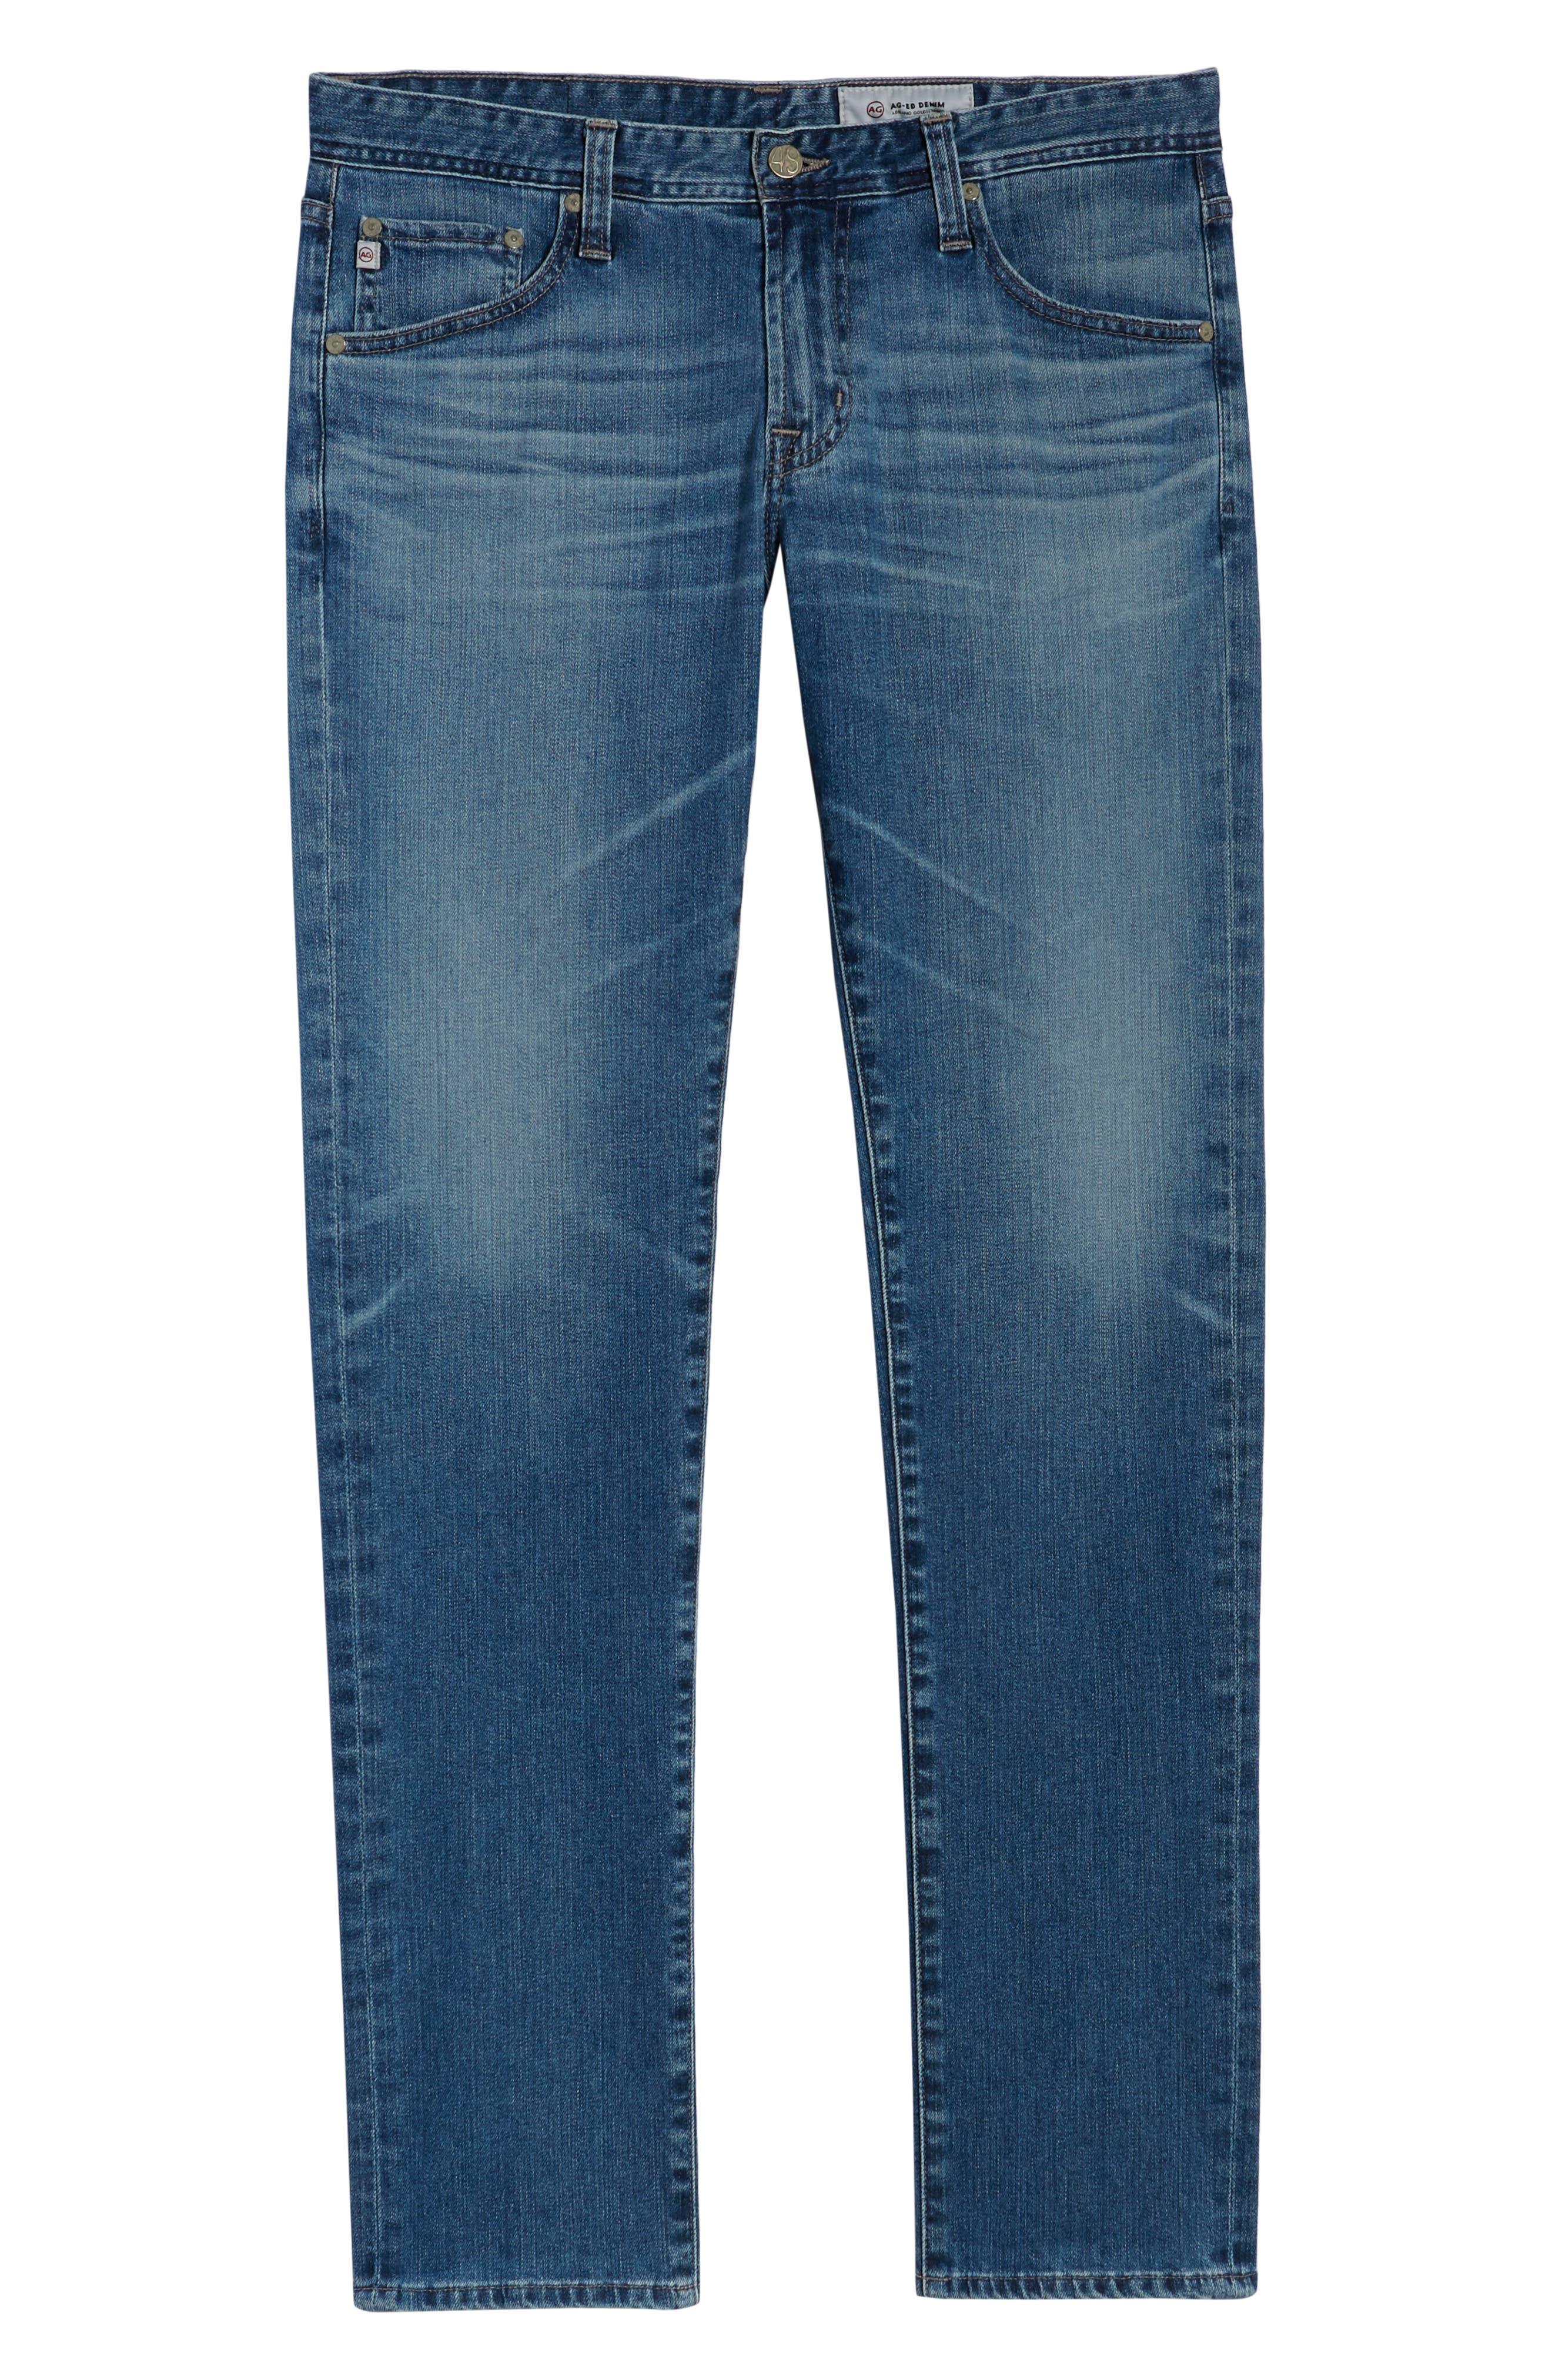 Tellis Slim Fit Jeans,                             Alternate thumbnail 6, color,                             16 YEARS EAVES